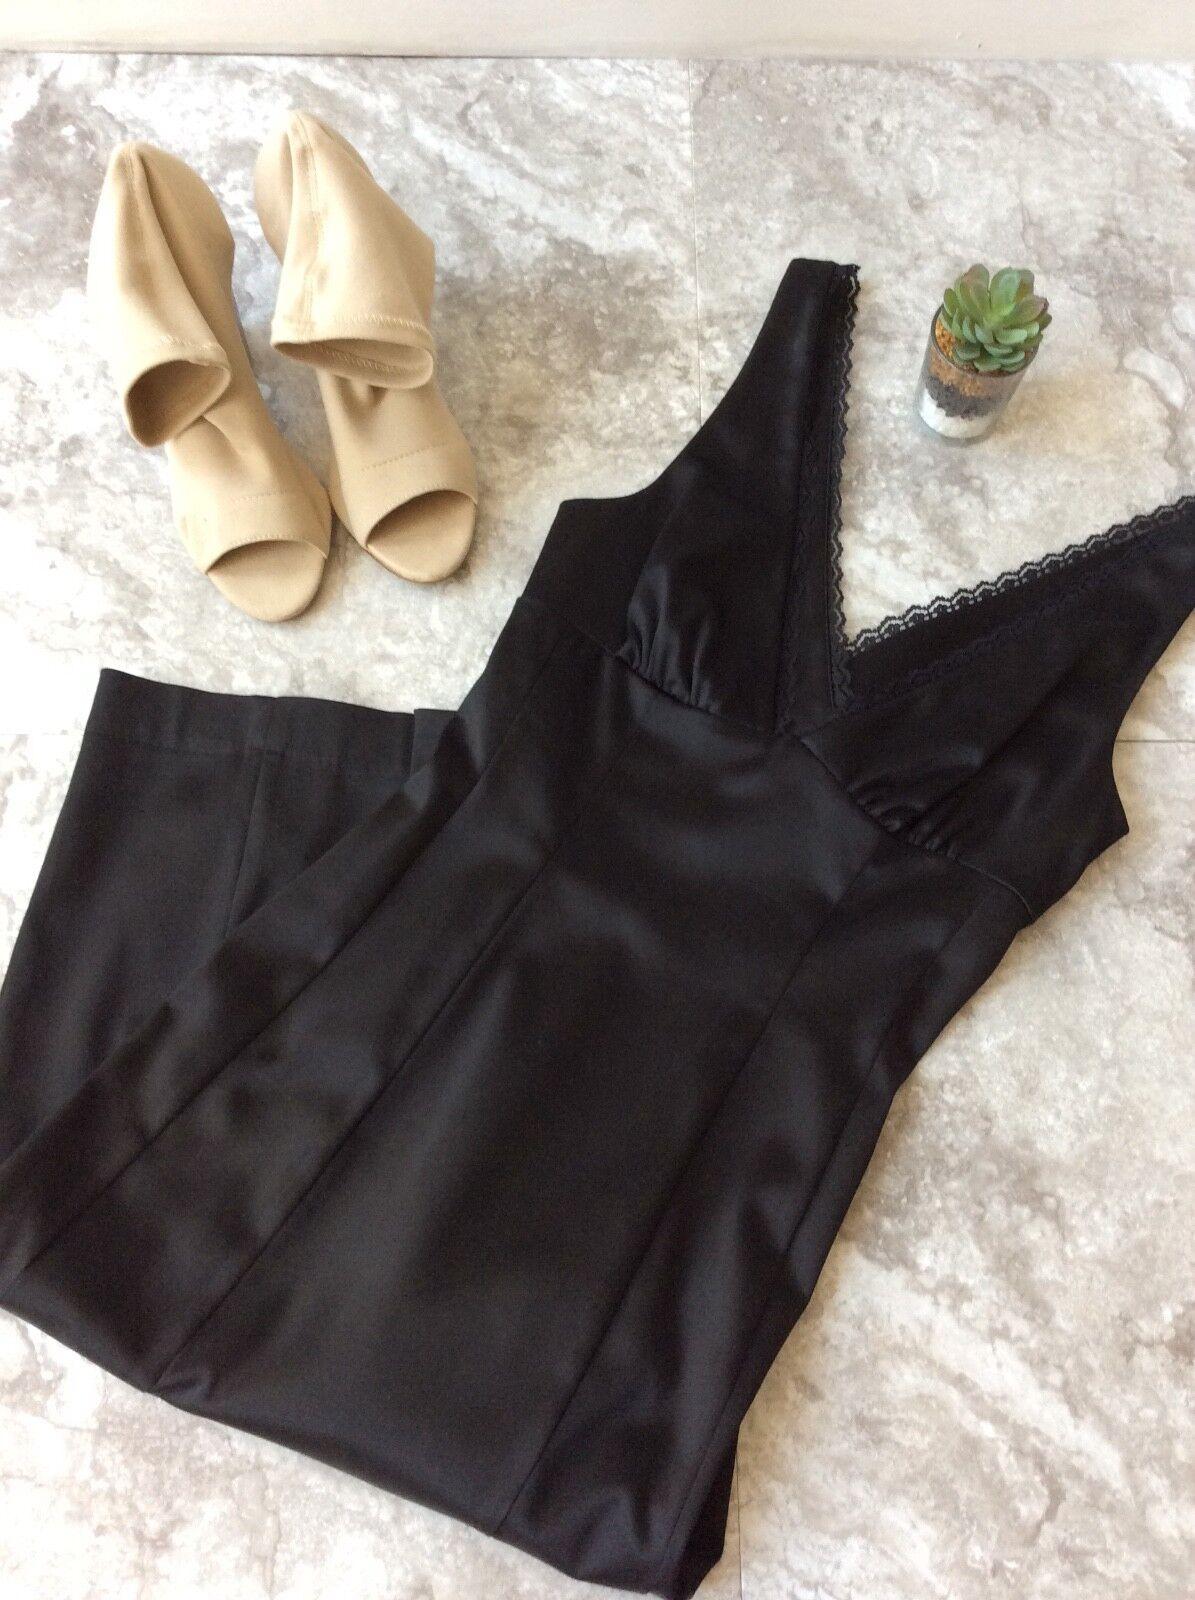 BeBe schwarz Deep-V Cocktail Dress Größe xs, Cocktail classy dress, woman's dress